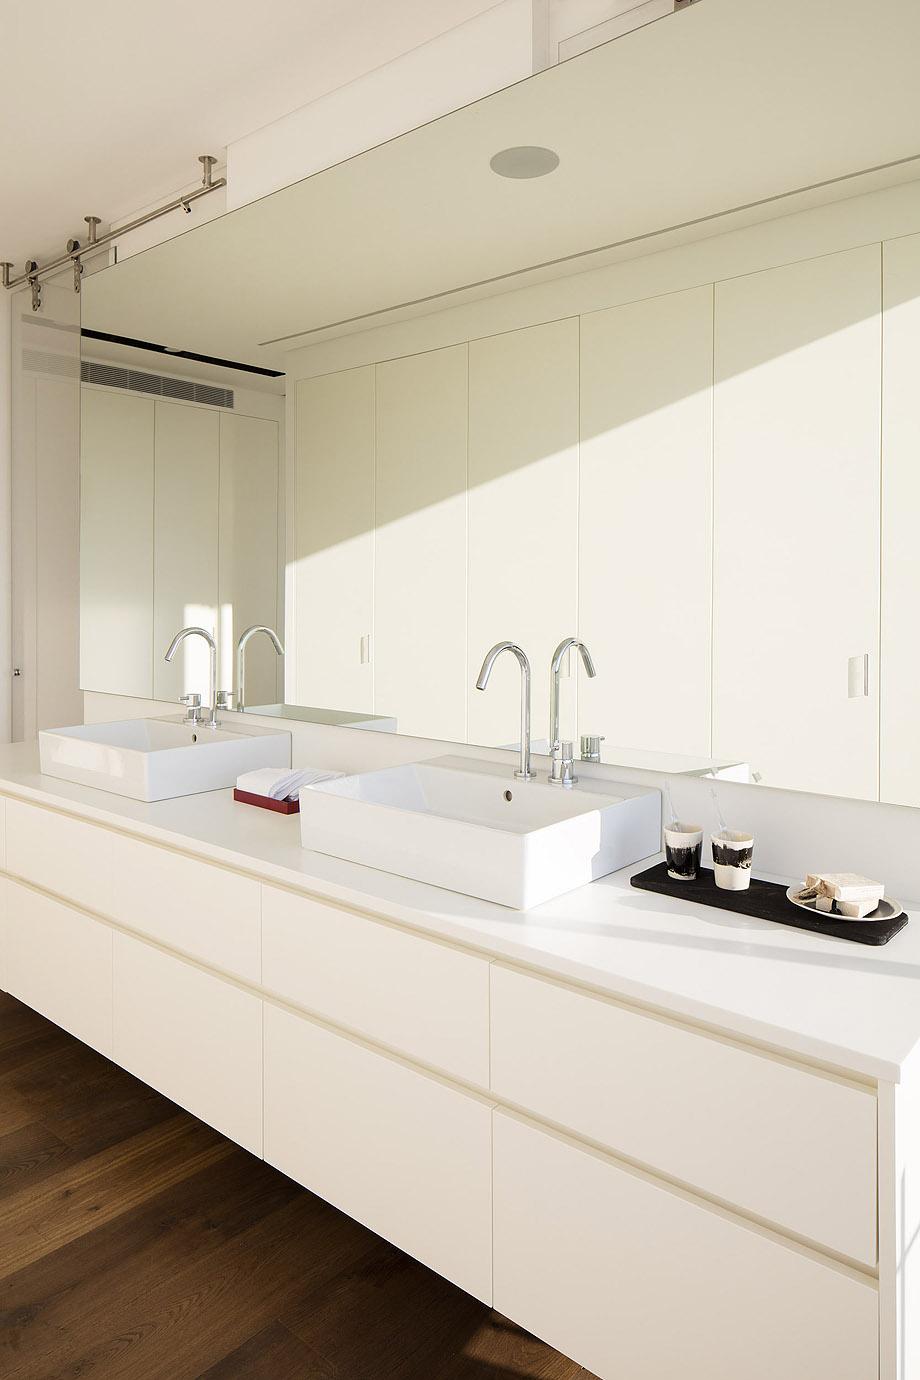 casa dual de axelrod architects (11)